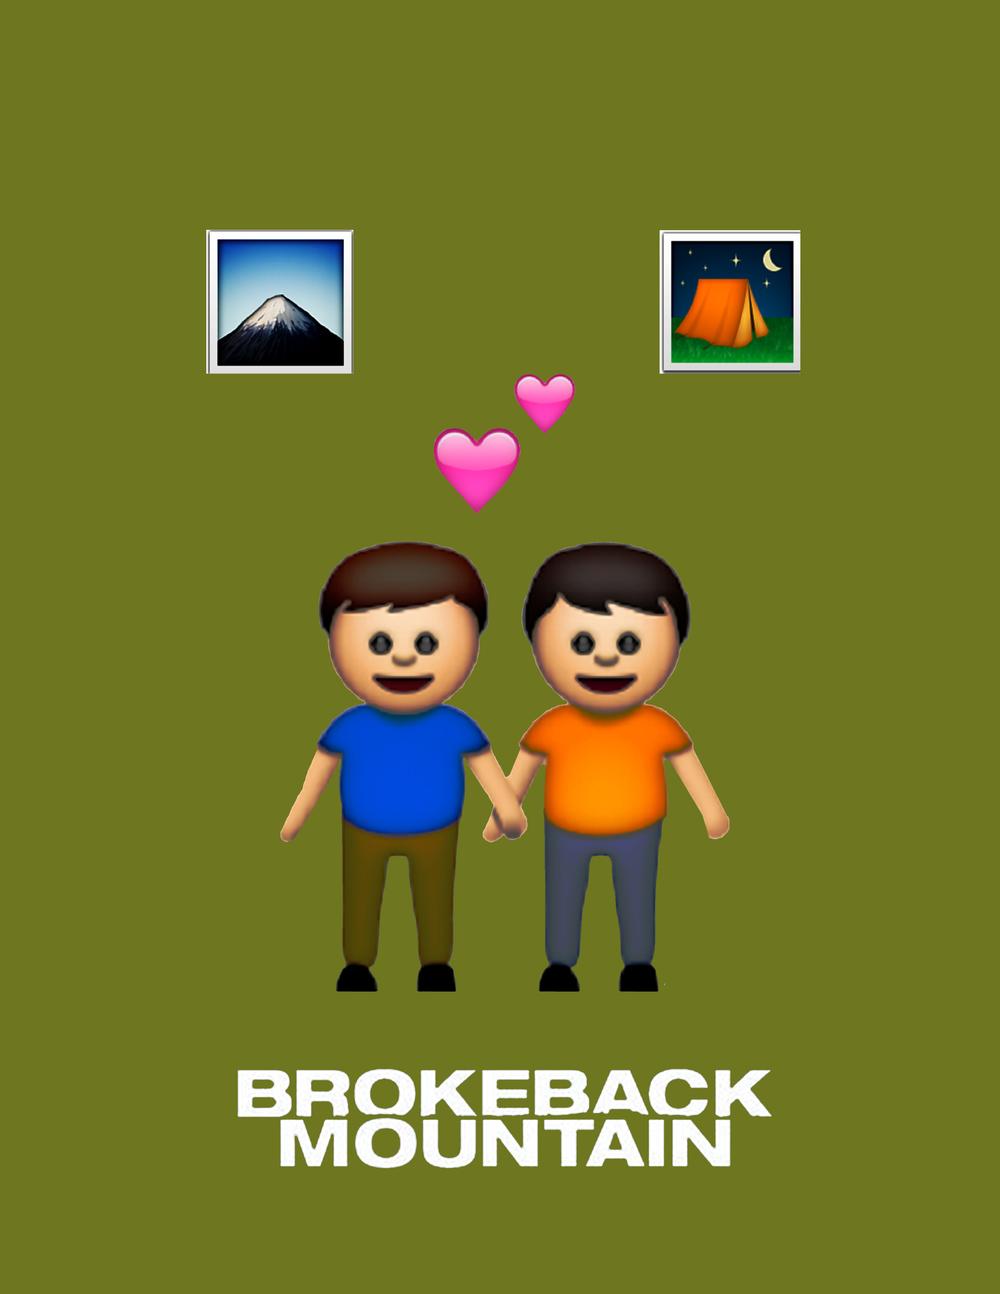 brokeback.jpg